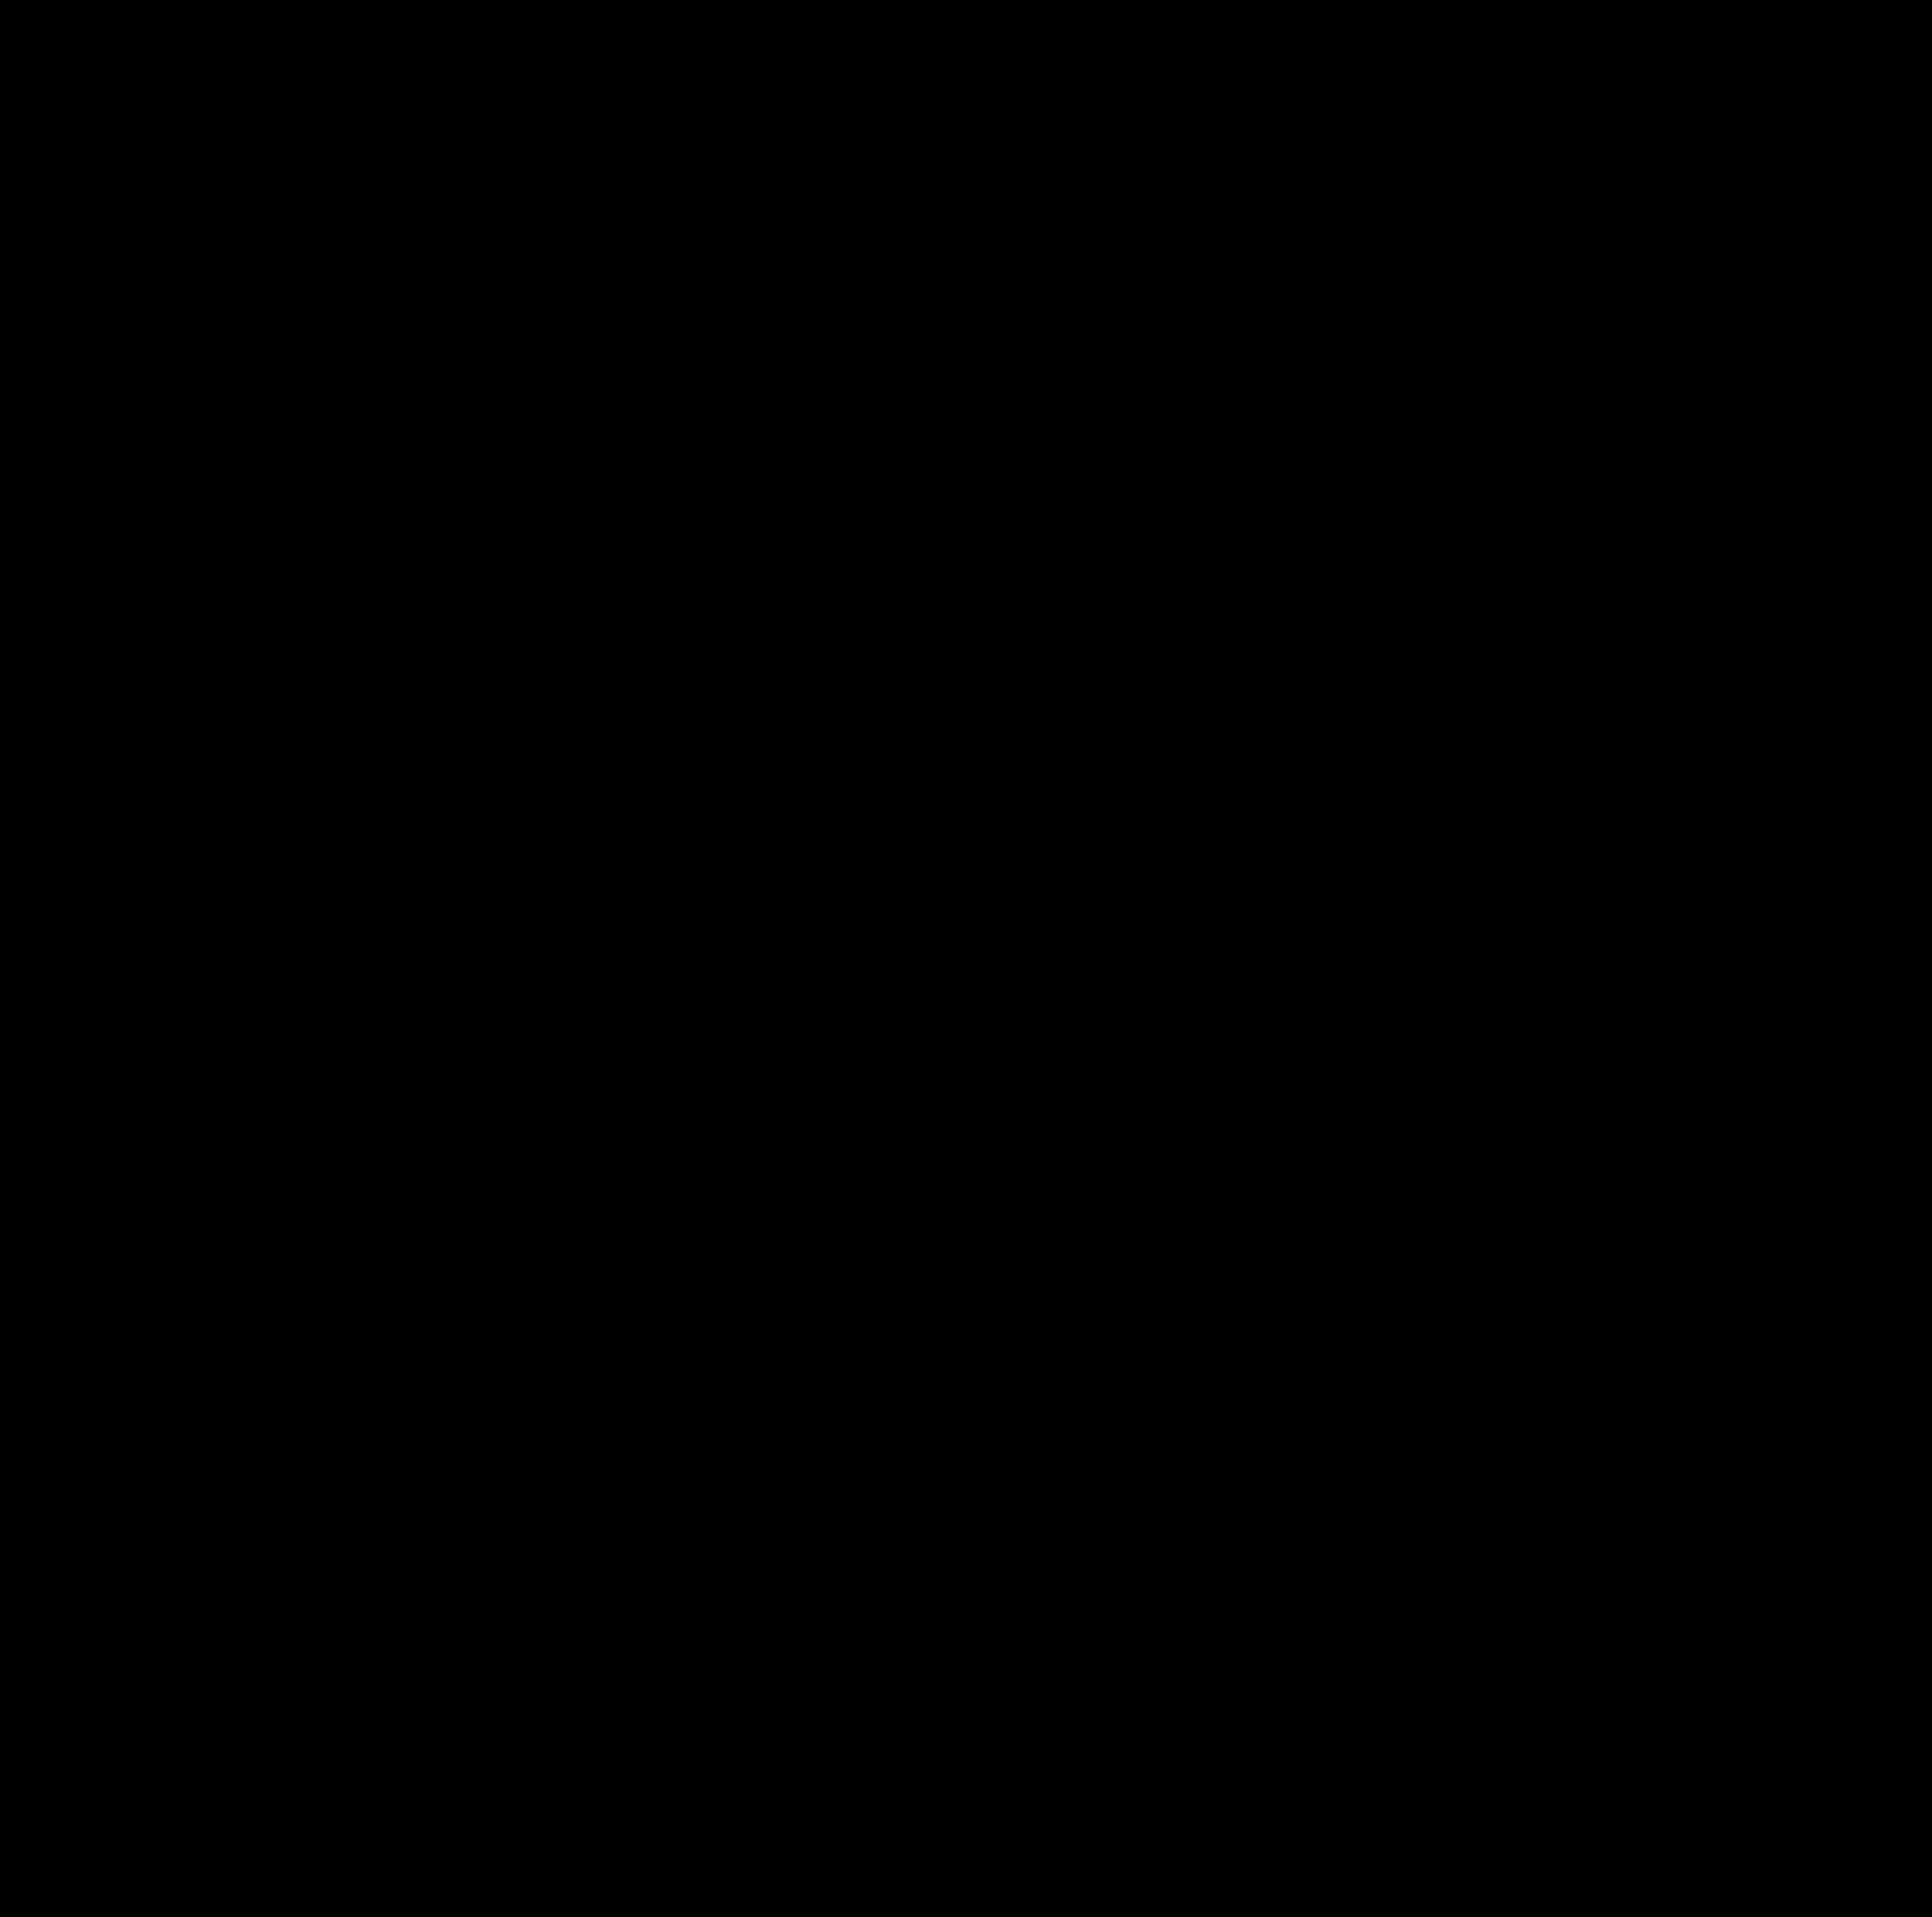 Celt clipart transparent Knot clipart ClipartBarn vector clip